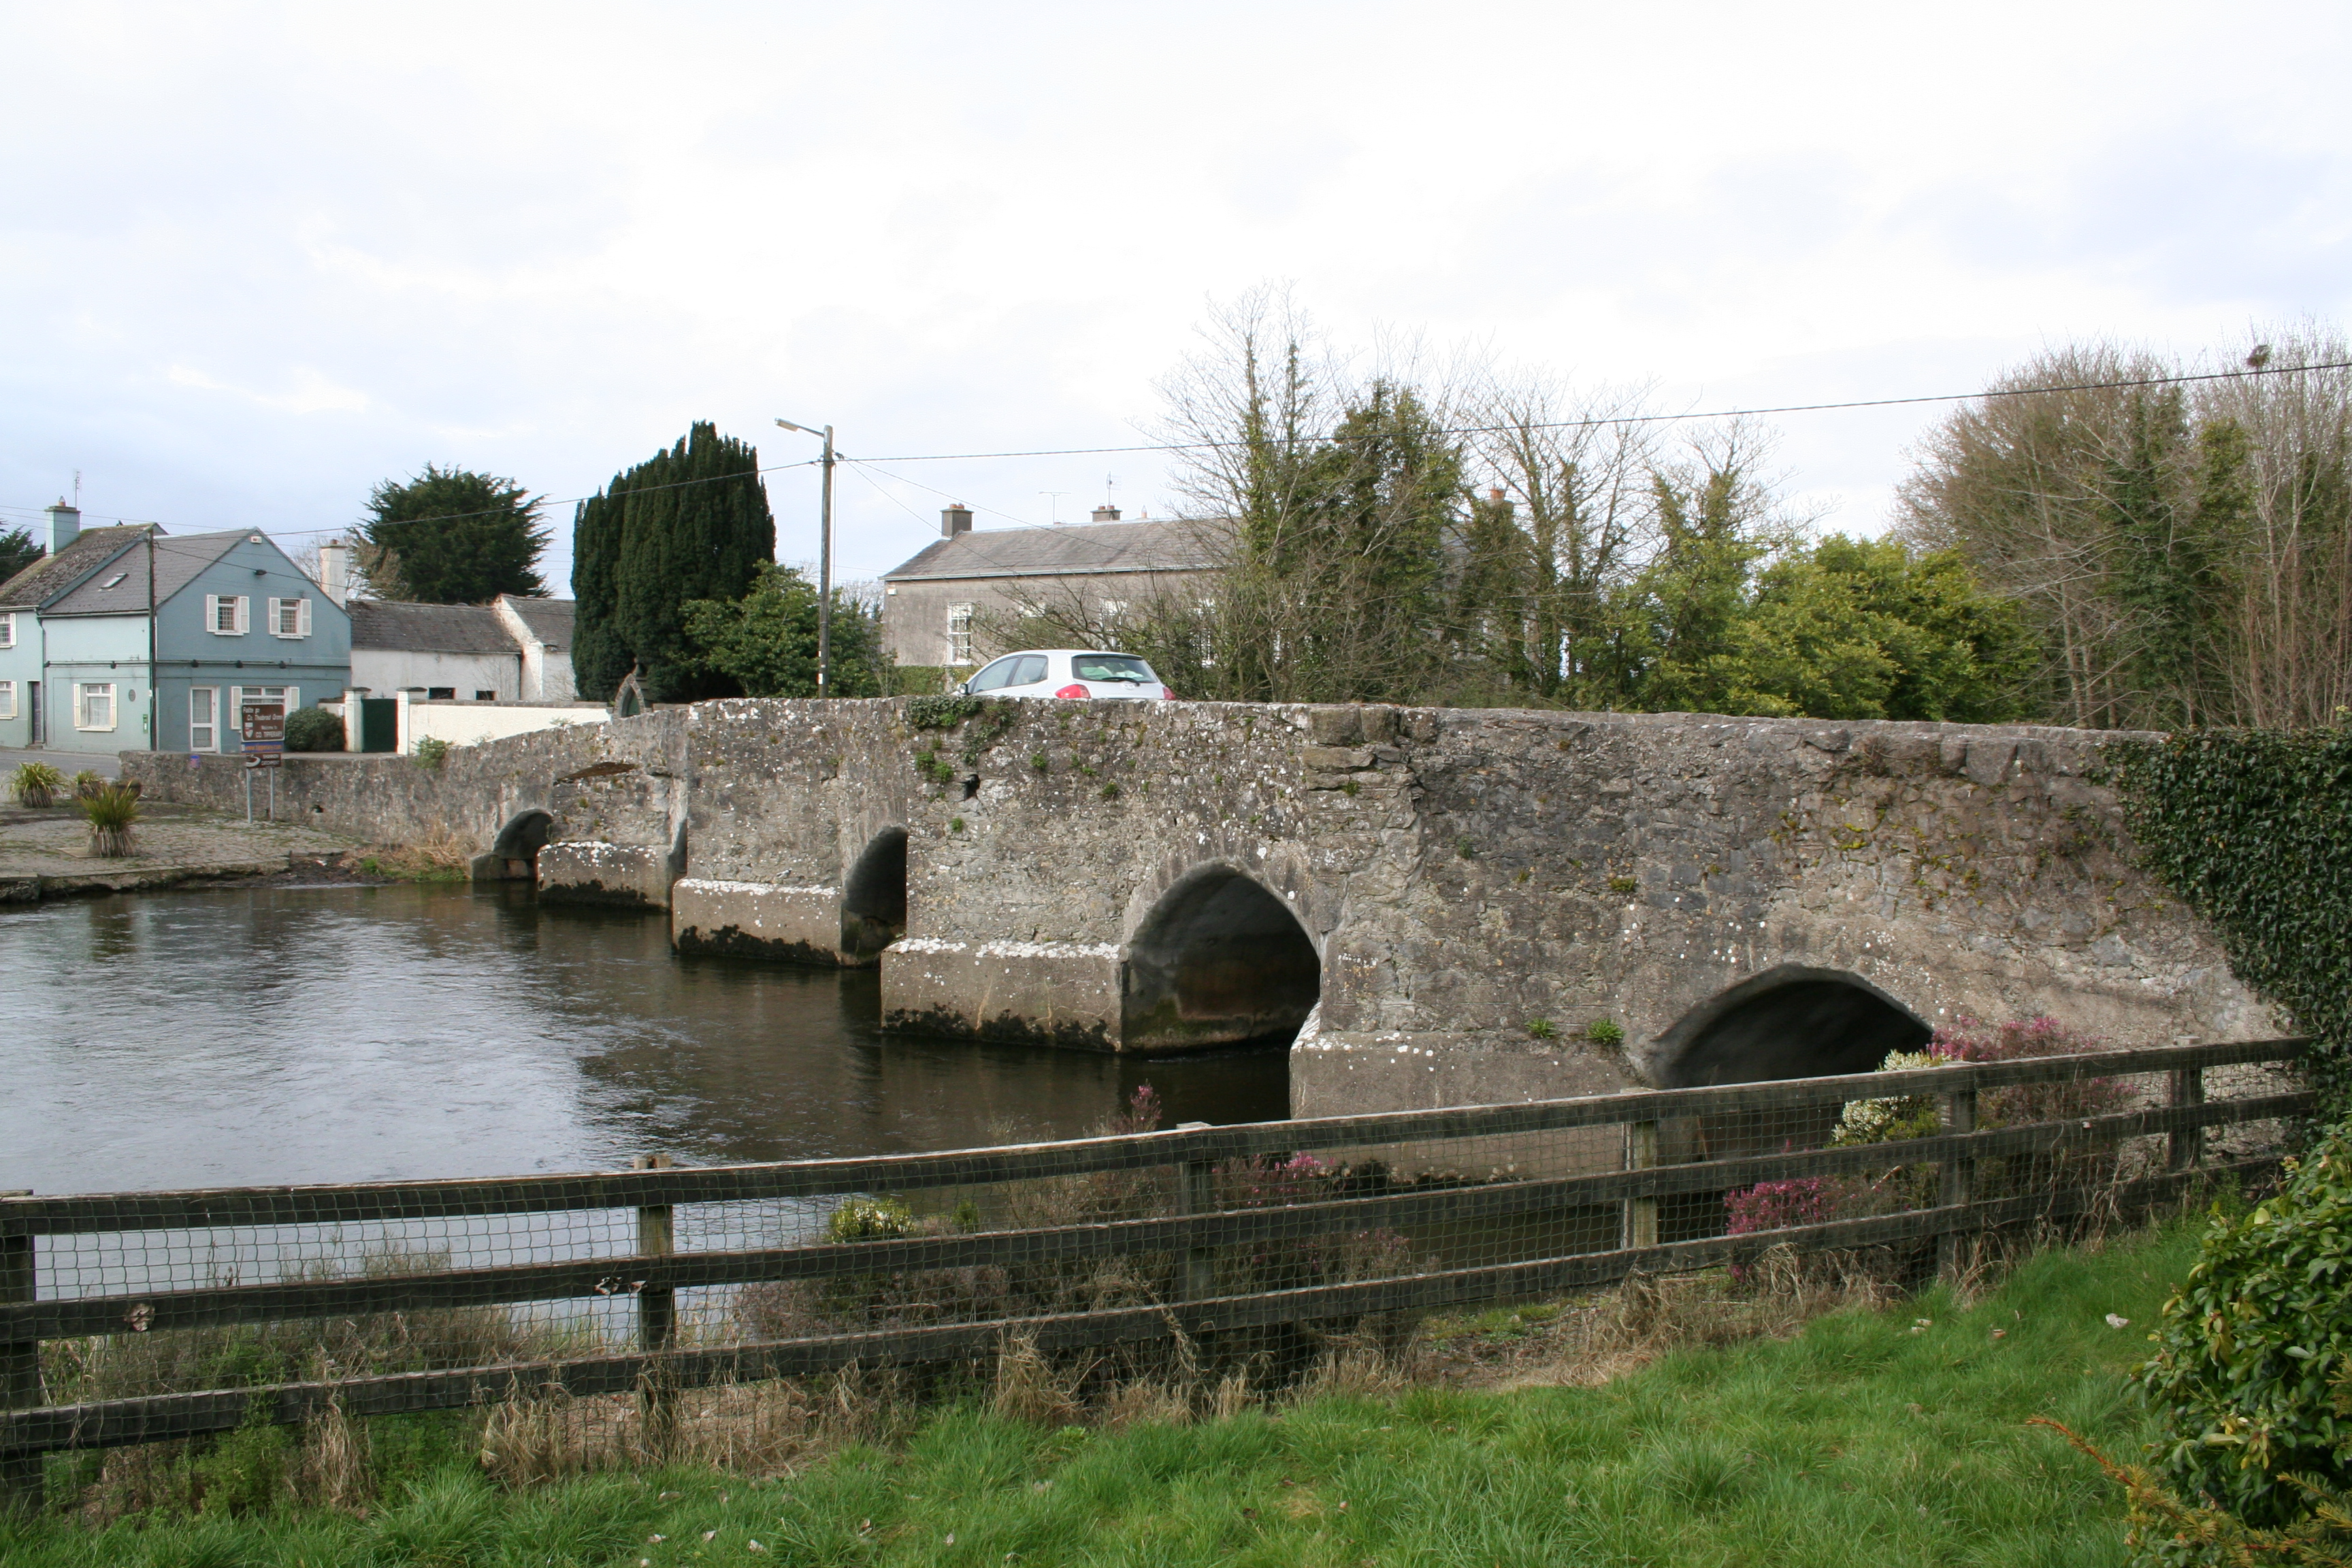 The bridge at Riverstown